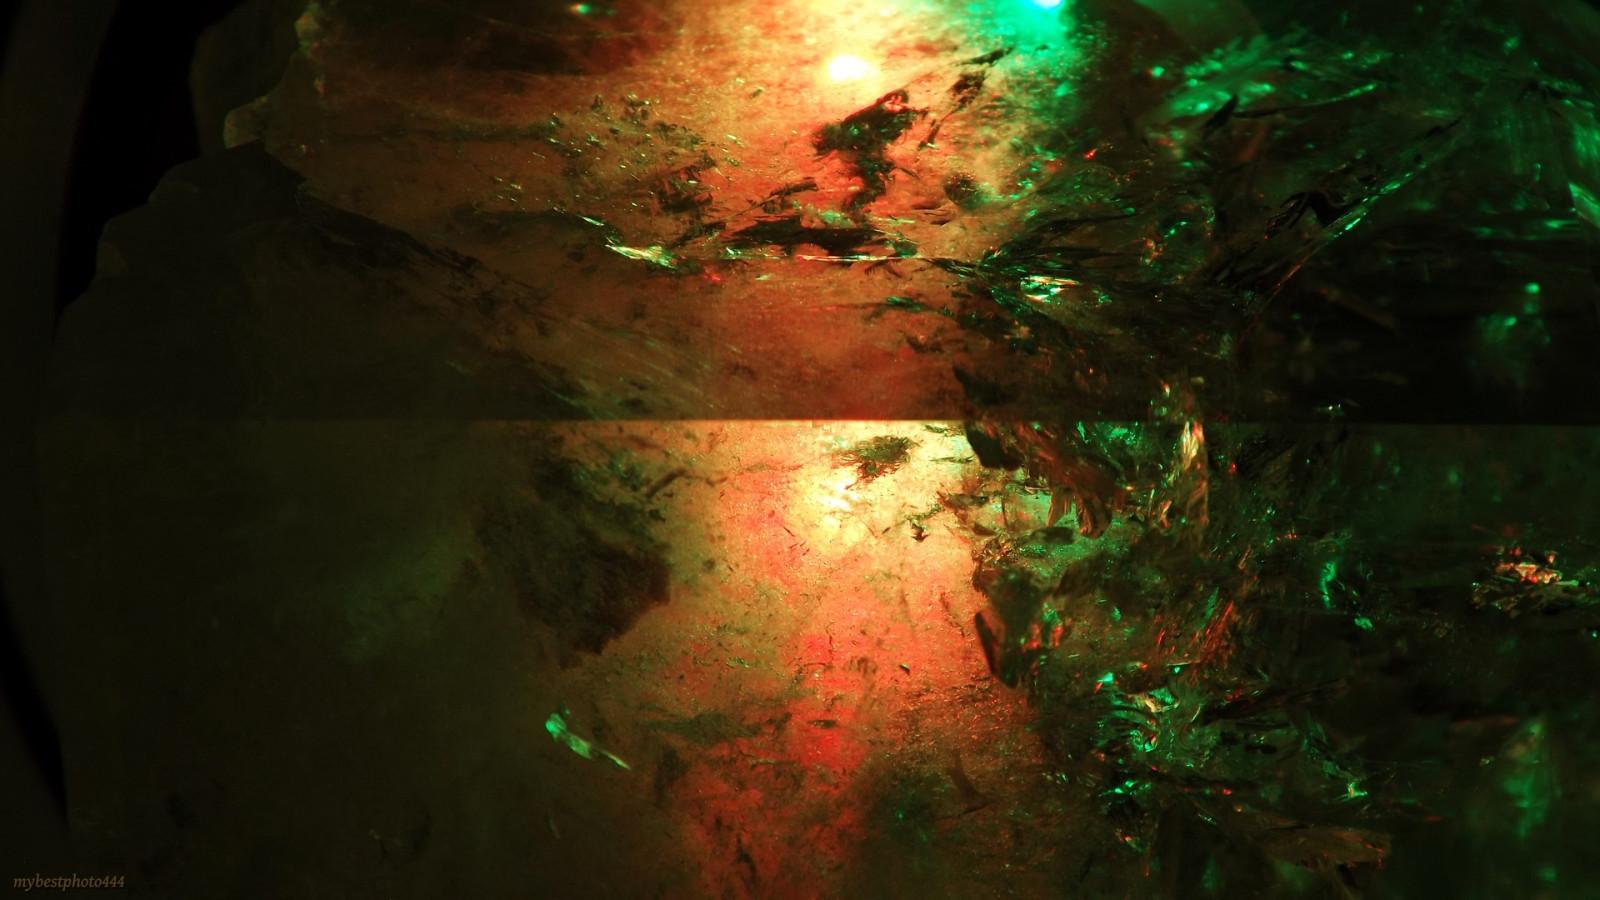 hintergrundbilder bilder nightphotography glas farben beleuchtung luces francisco. Black Bedroom Furniture Sets. Home Design Ideas